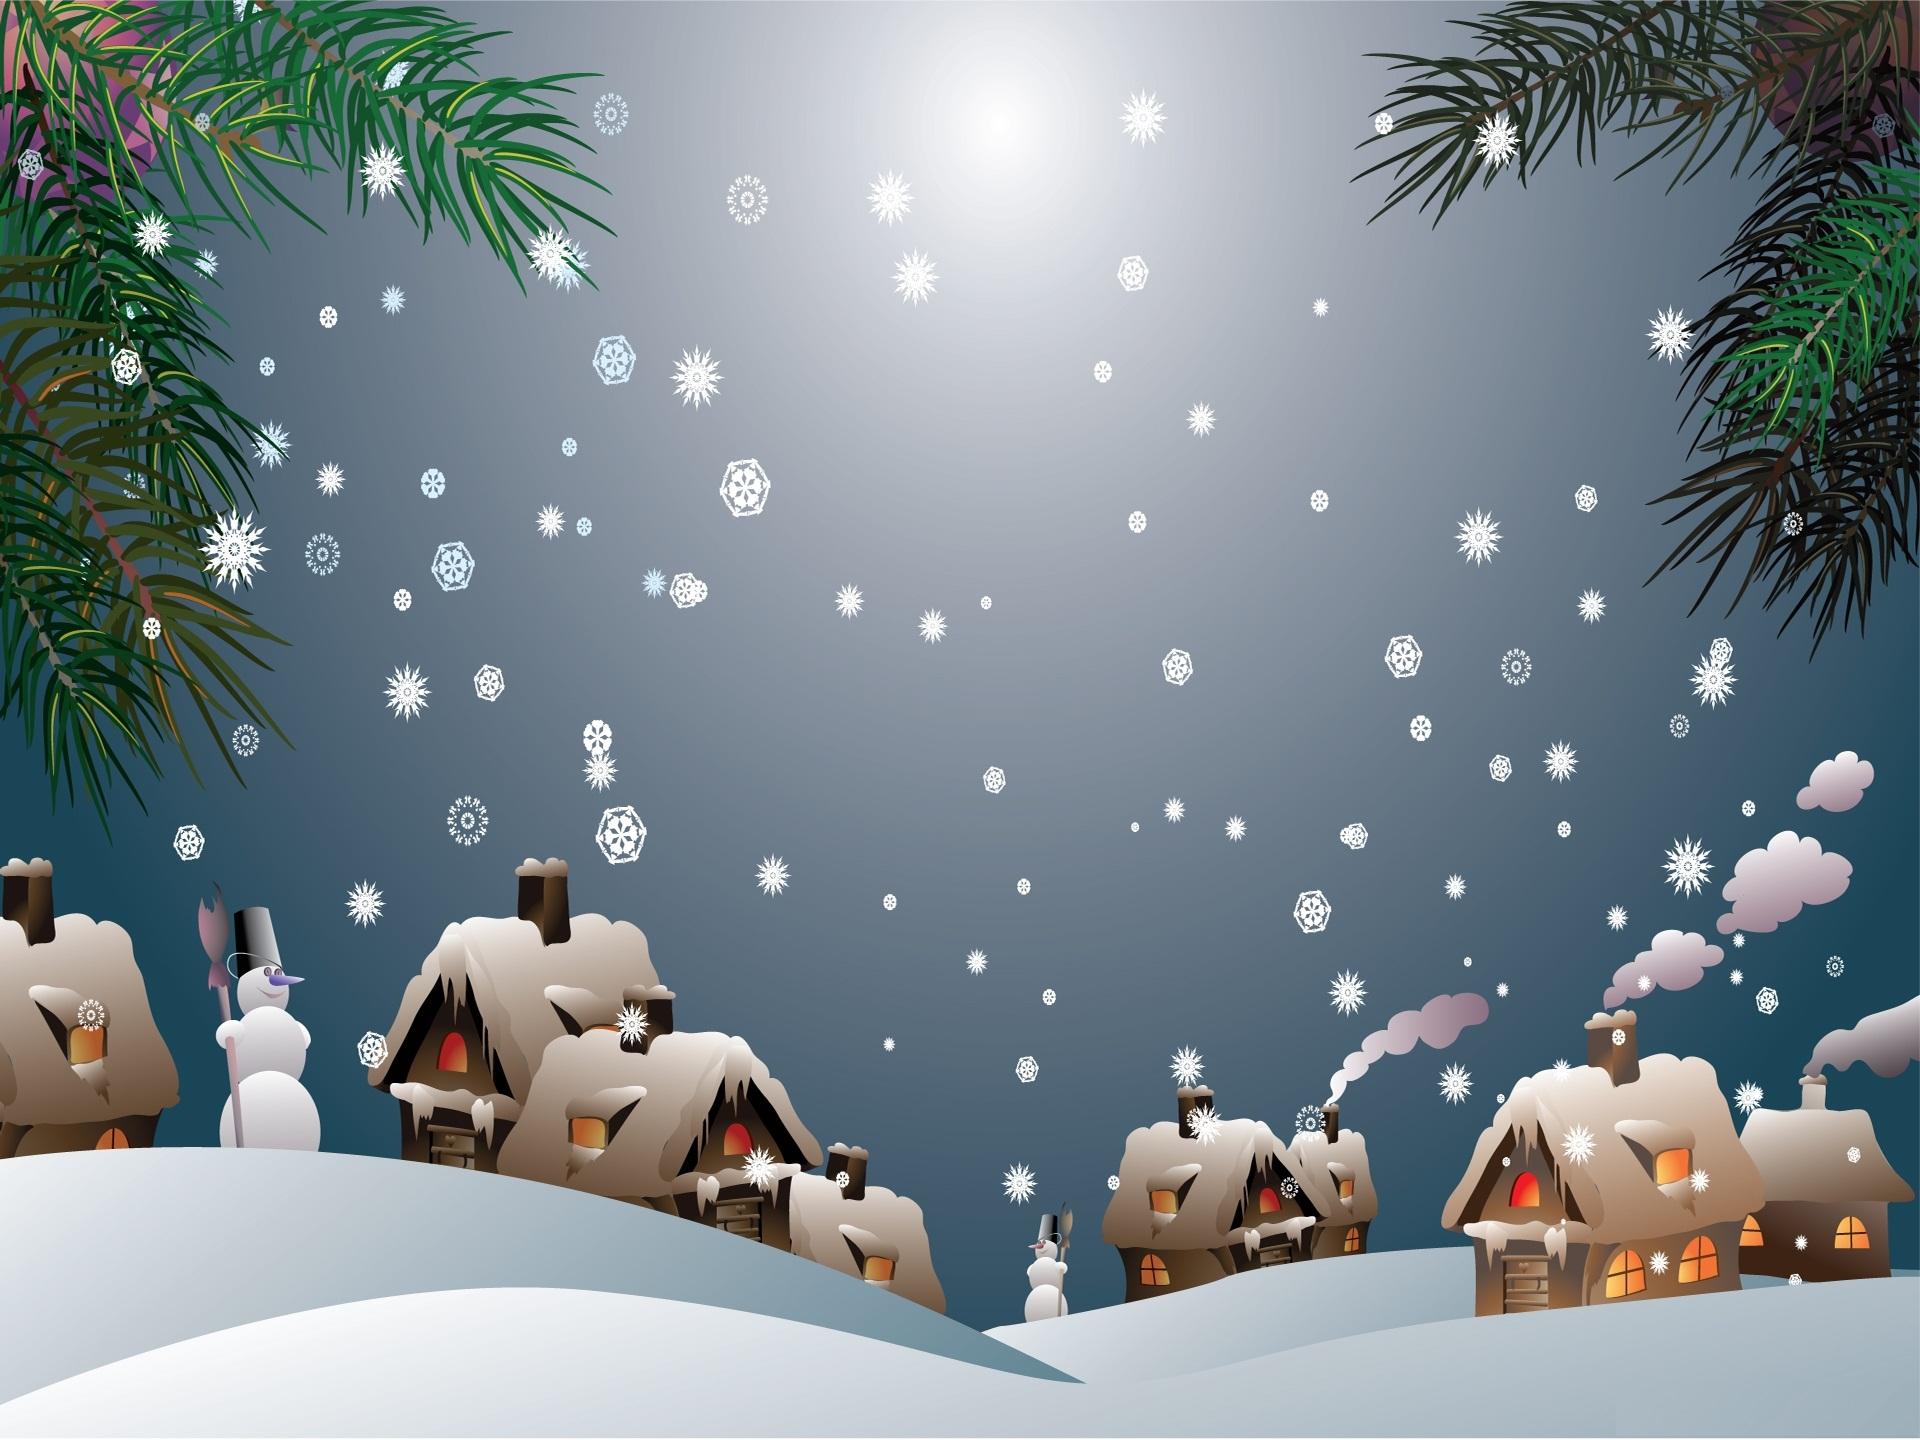 Pics Photos   Peaceful Christmas Village Hd Wallpapers 1920x1440